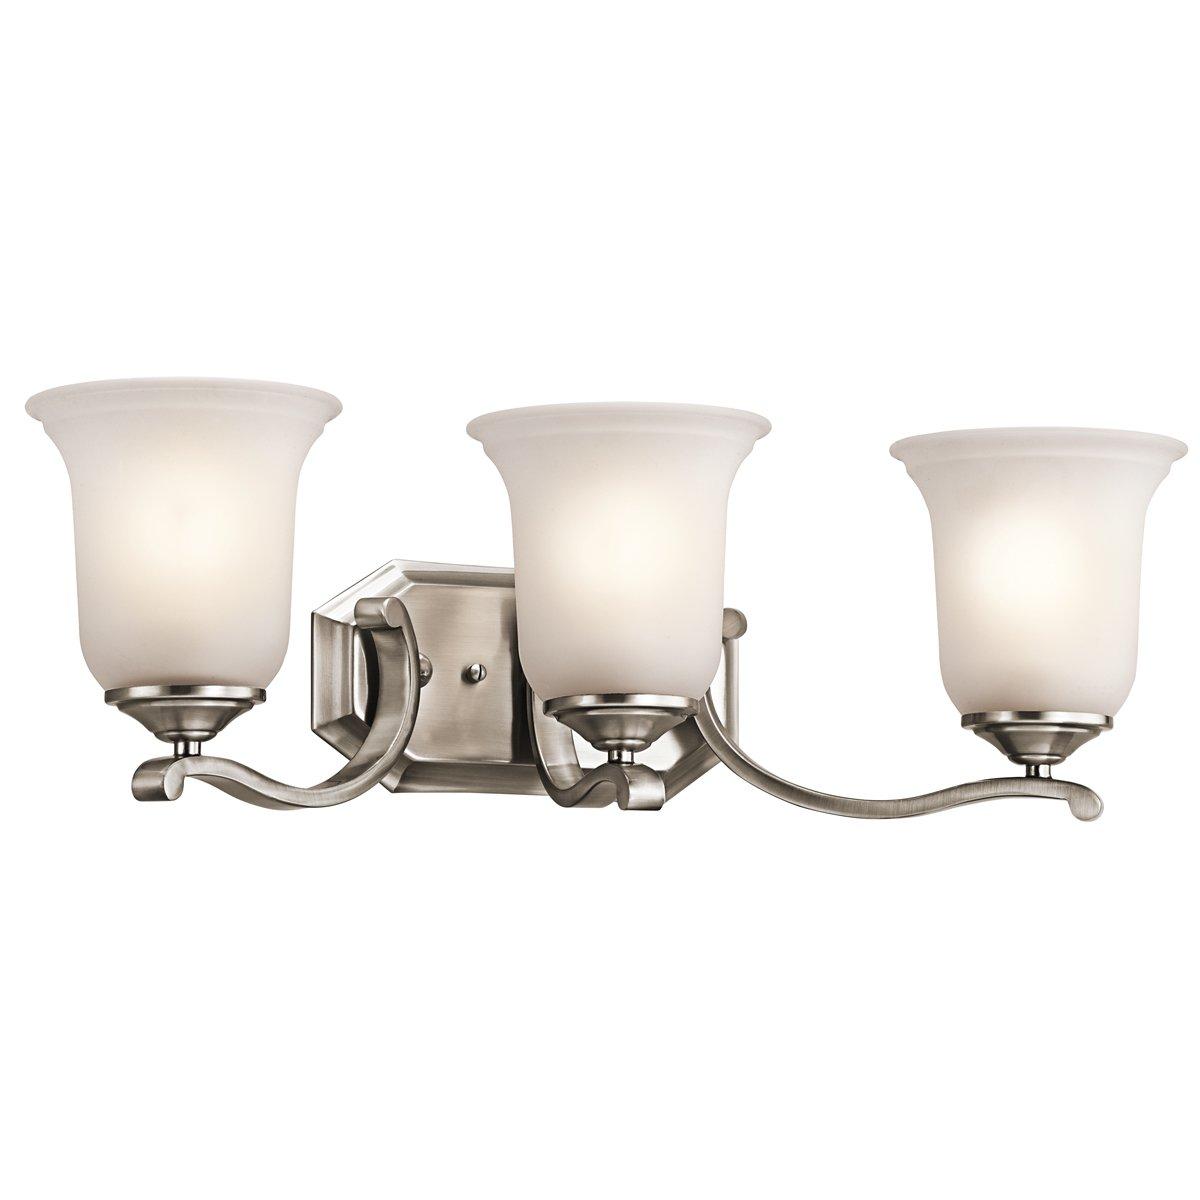 Kichler 45403CLP Three Light Bath   Vanity Lighting Fixtures   Amazon.com